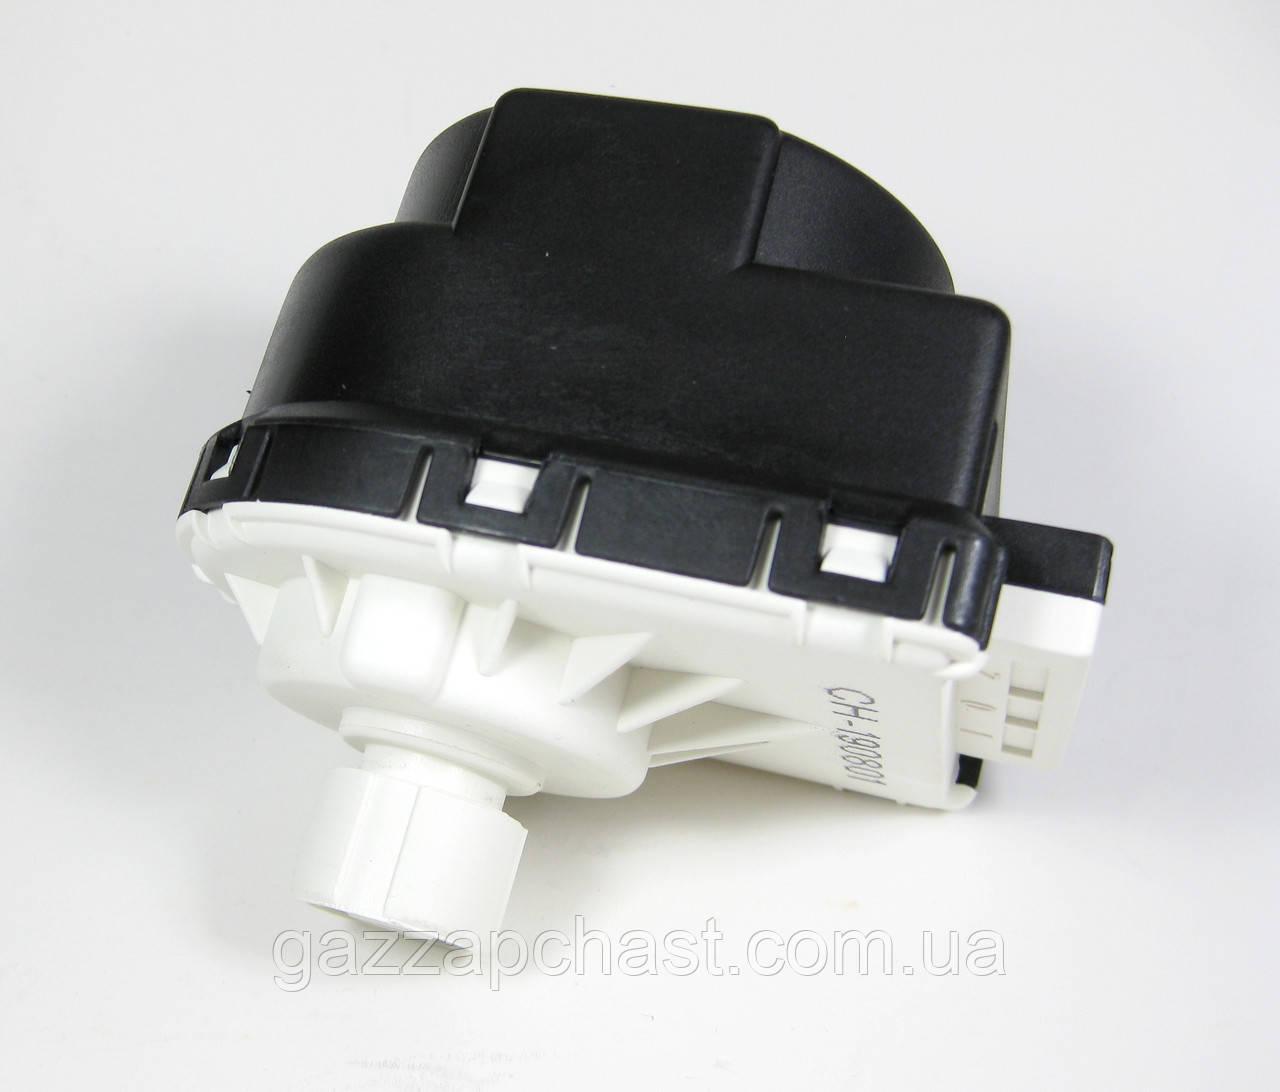 Электропривод трехходового клапана Baxi, Westen 56945801